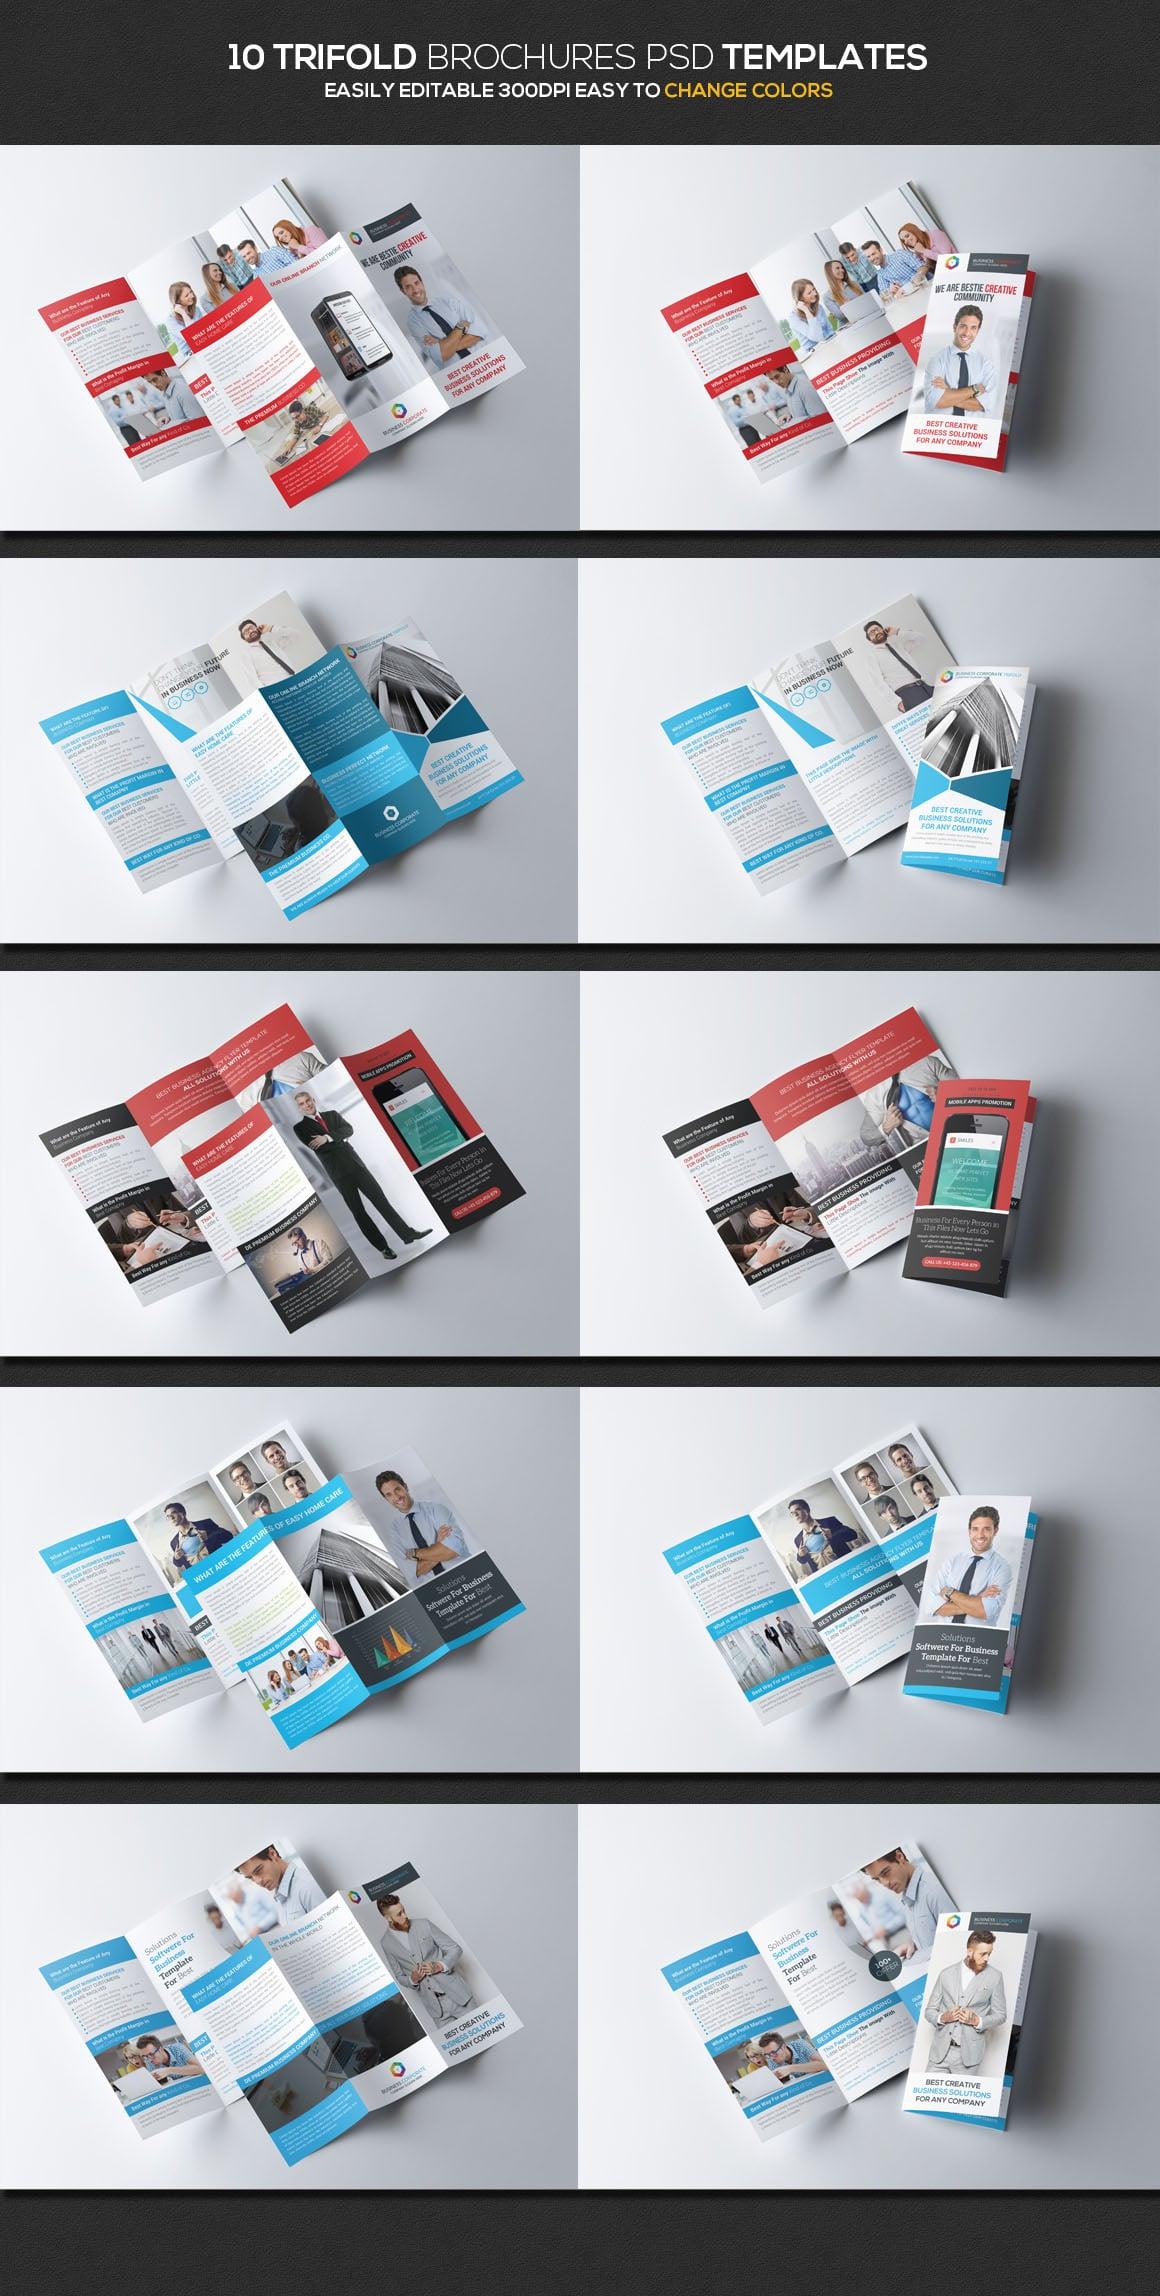 Huge Print Bundle: 130 Print Templates – $23 | Master Bundles